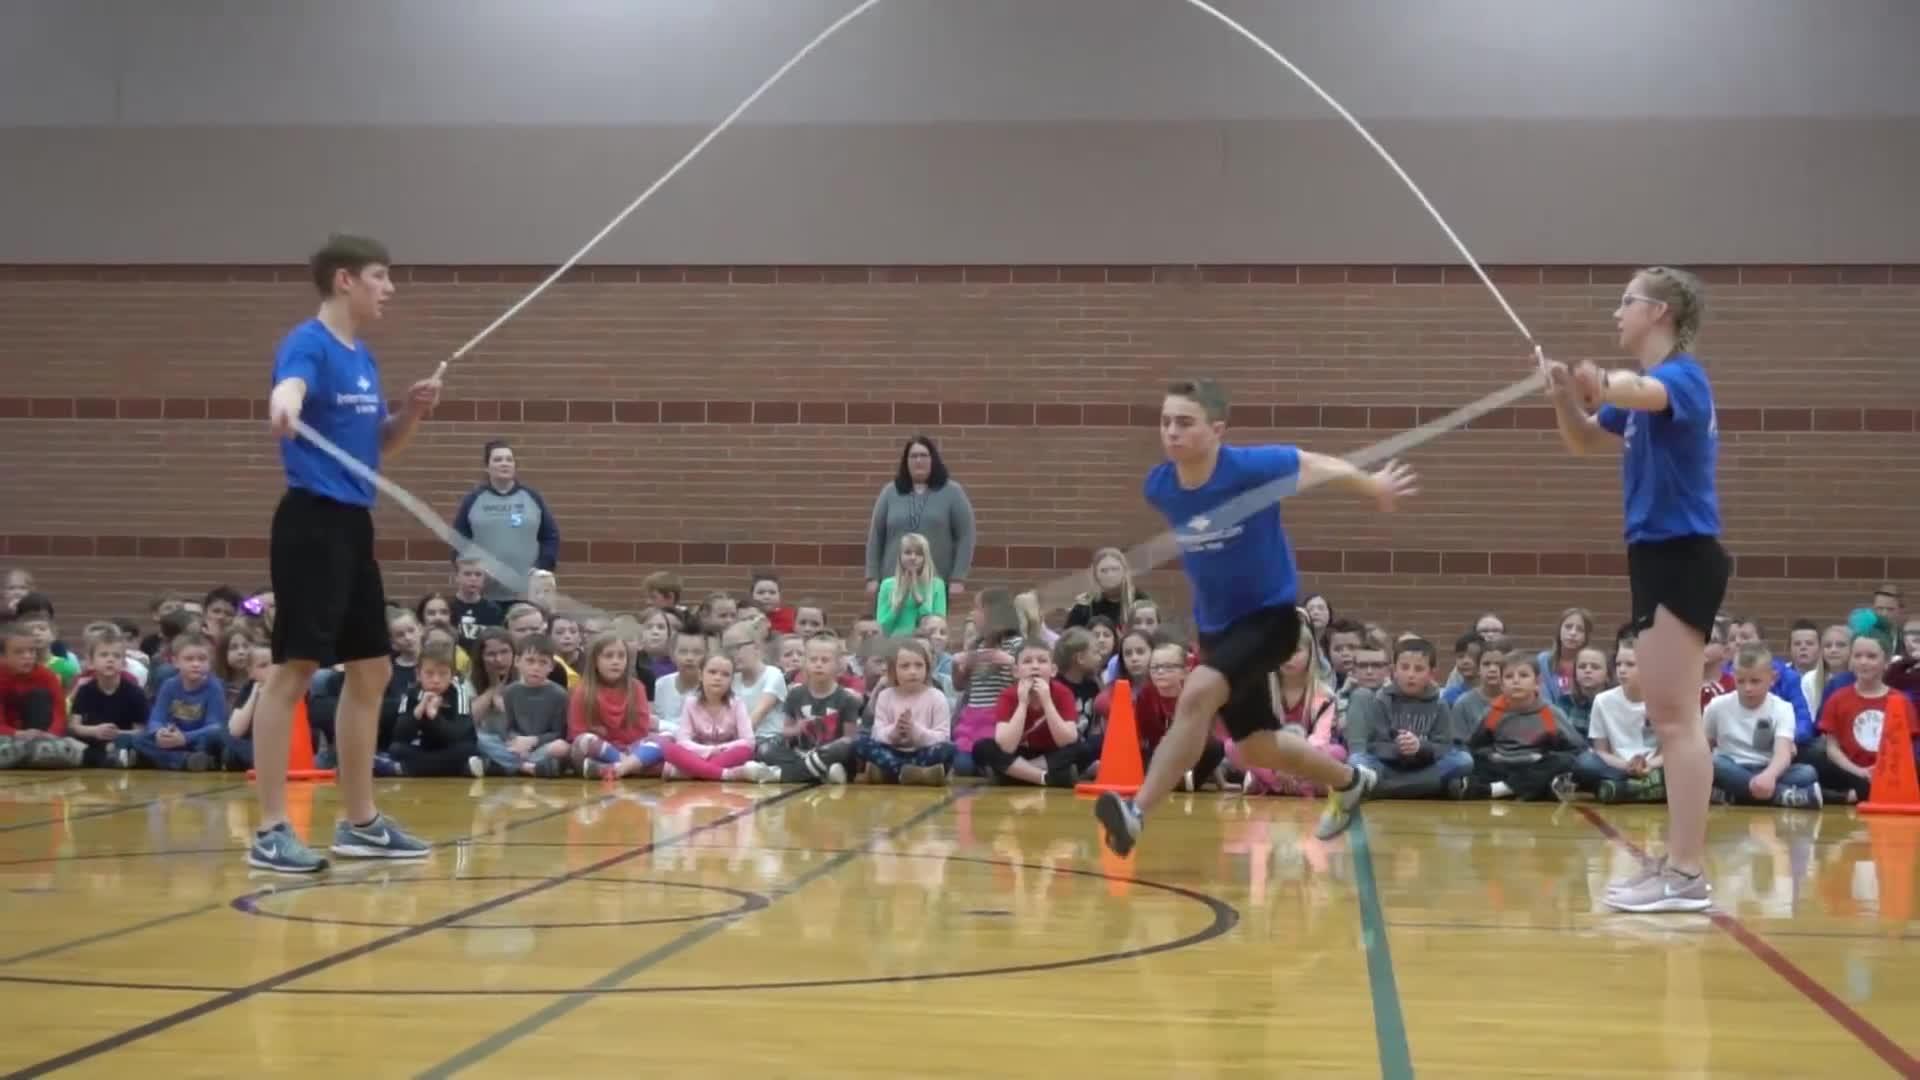 Film & Animation, WeJumpRope Music Videos, basketball, double dutch, flips, porter ballard, proform airborn, utah, wejumprope, JOLT 2019 - the BEST jump rope event in Utah GIFs